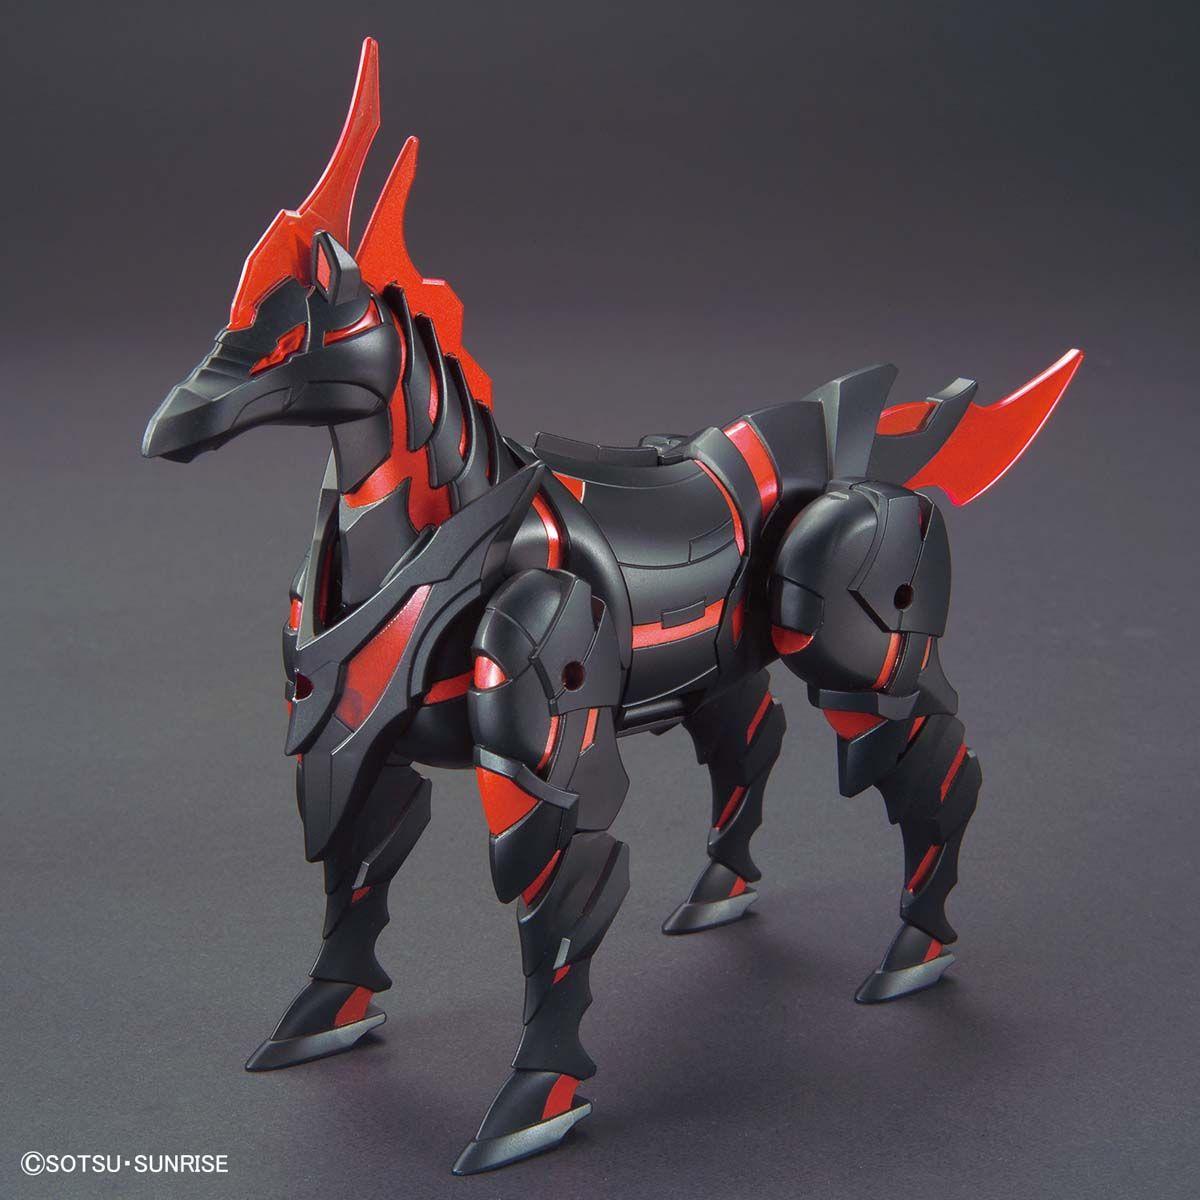 SDガンダムワールドヒーローズ(SDW HEROES) 軍馬 5061664 4573102616647